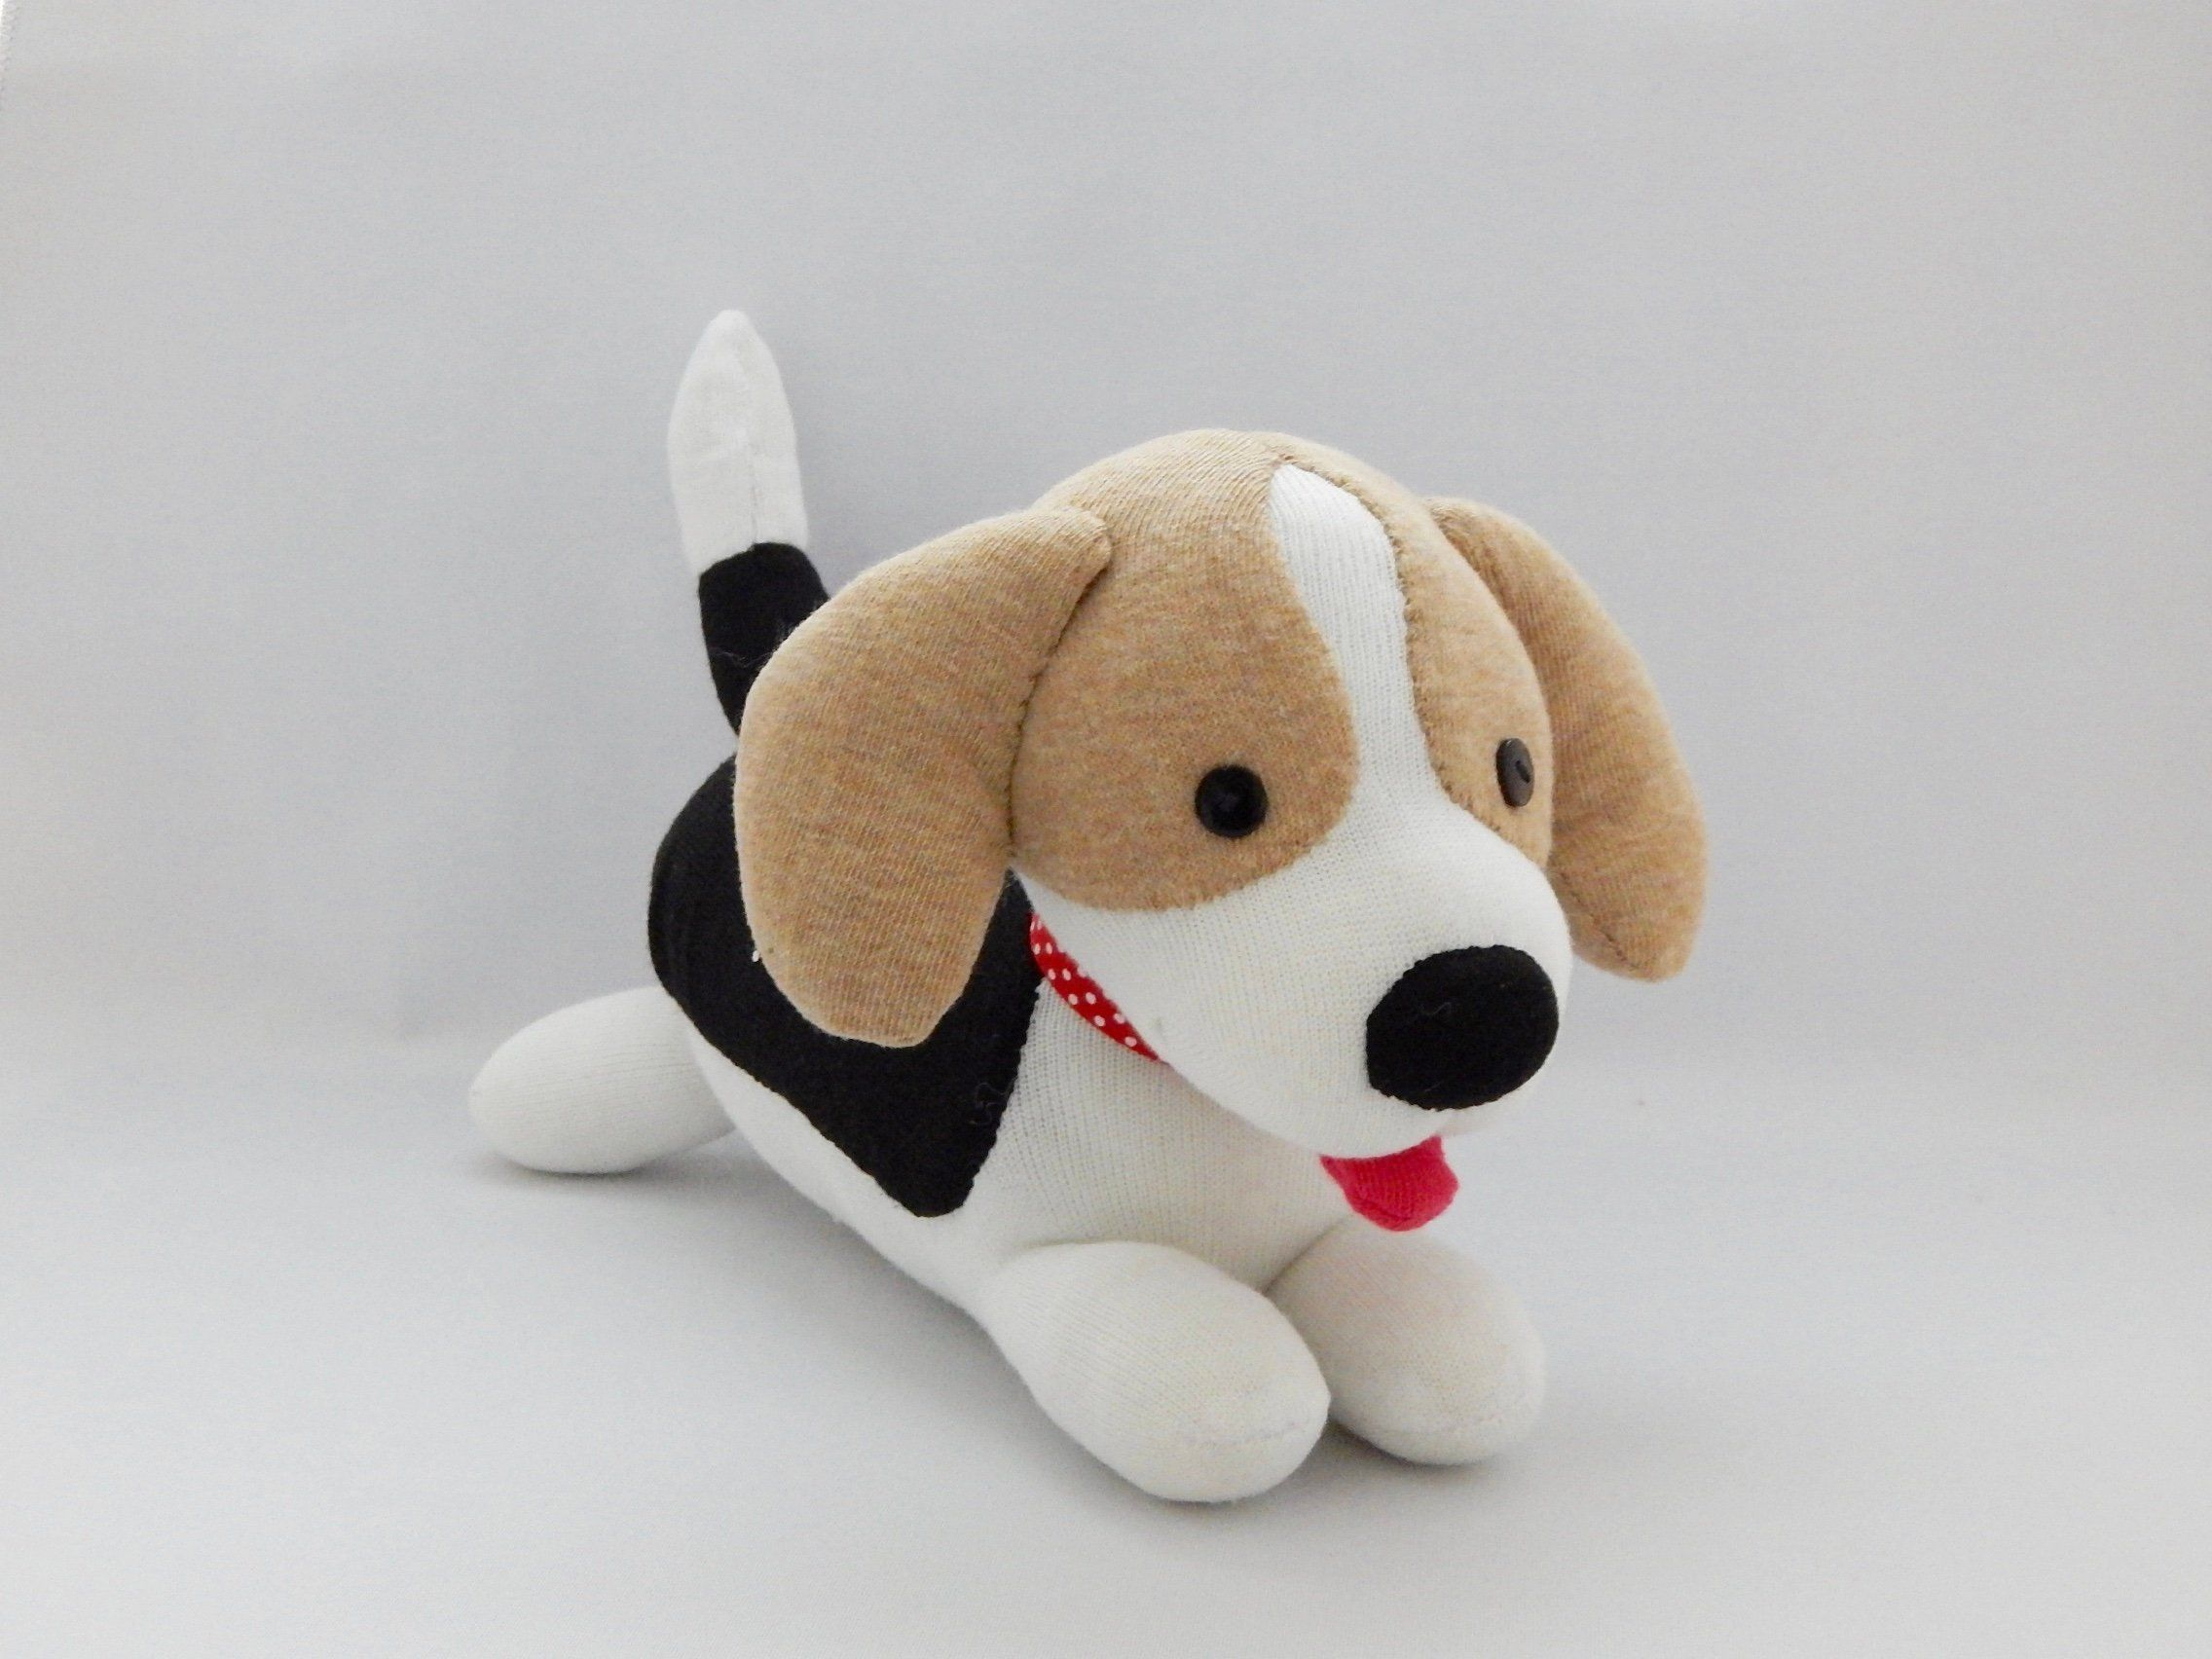 Beagle Puppy Plush Toy Dog Stuffed Animal Stuffed Doll Stuffed Toy Sock Monkey Puppy Plush Toys Dog Stuffed Animal Beagle Puppy [ 1704 x 2272 Pixel ]